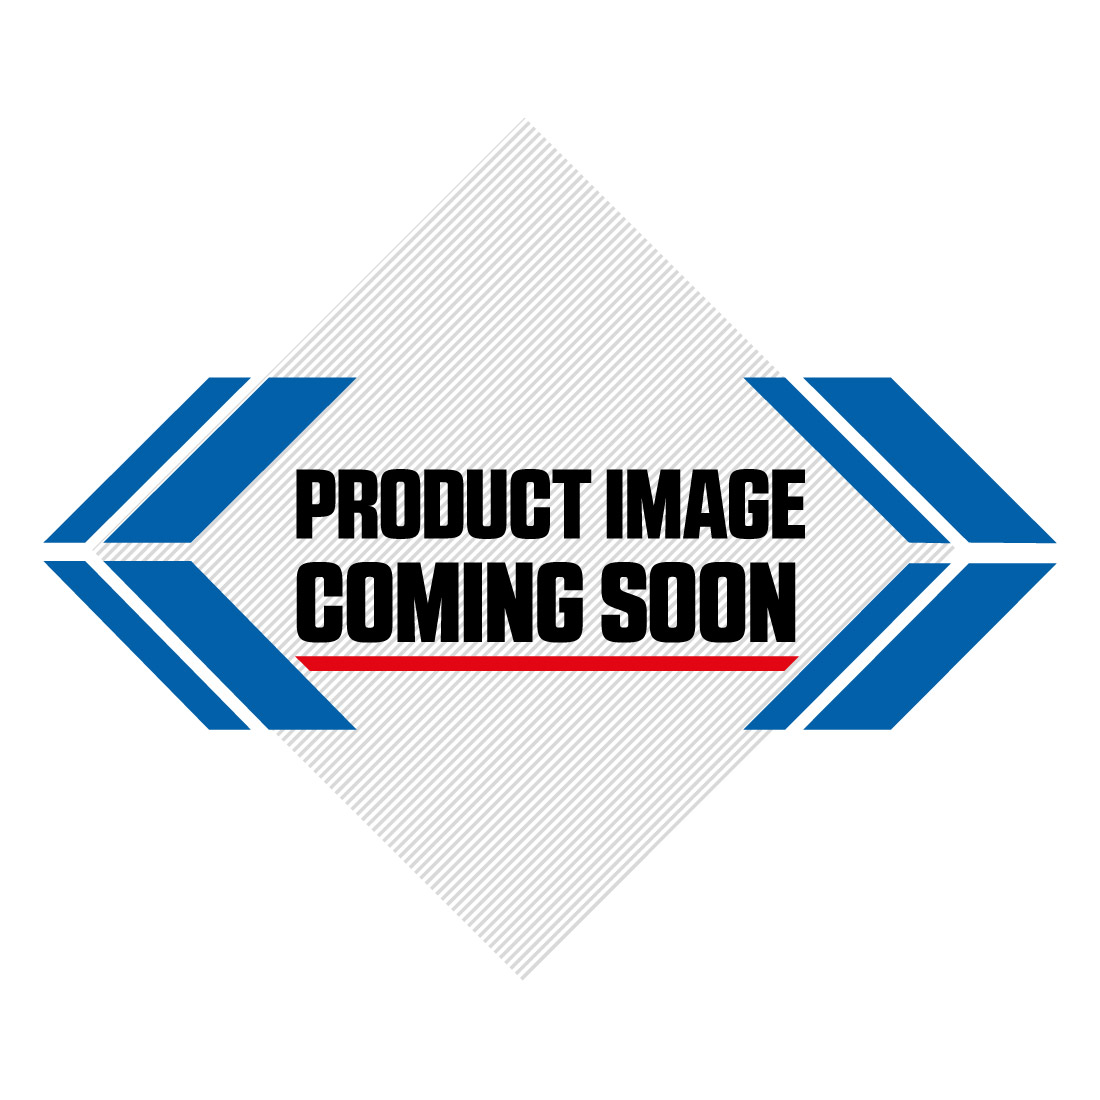 UFO Honda Radiator louvers CRF 250R (18-19) CRF 250RX (2019) OEM Factory Image-2>